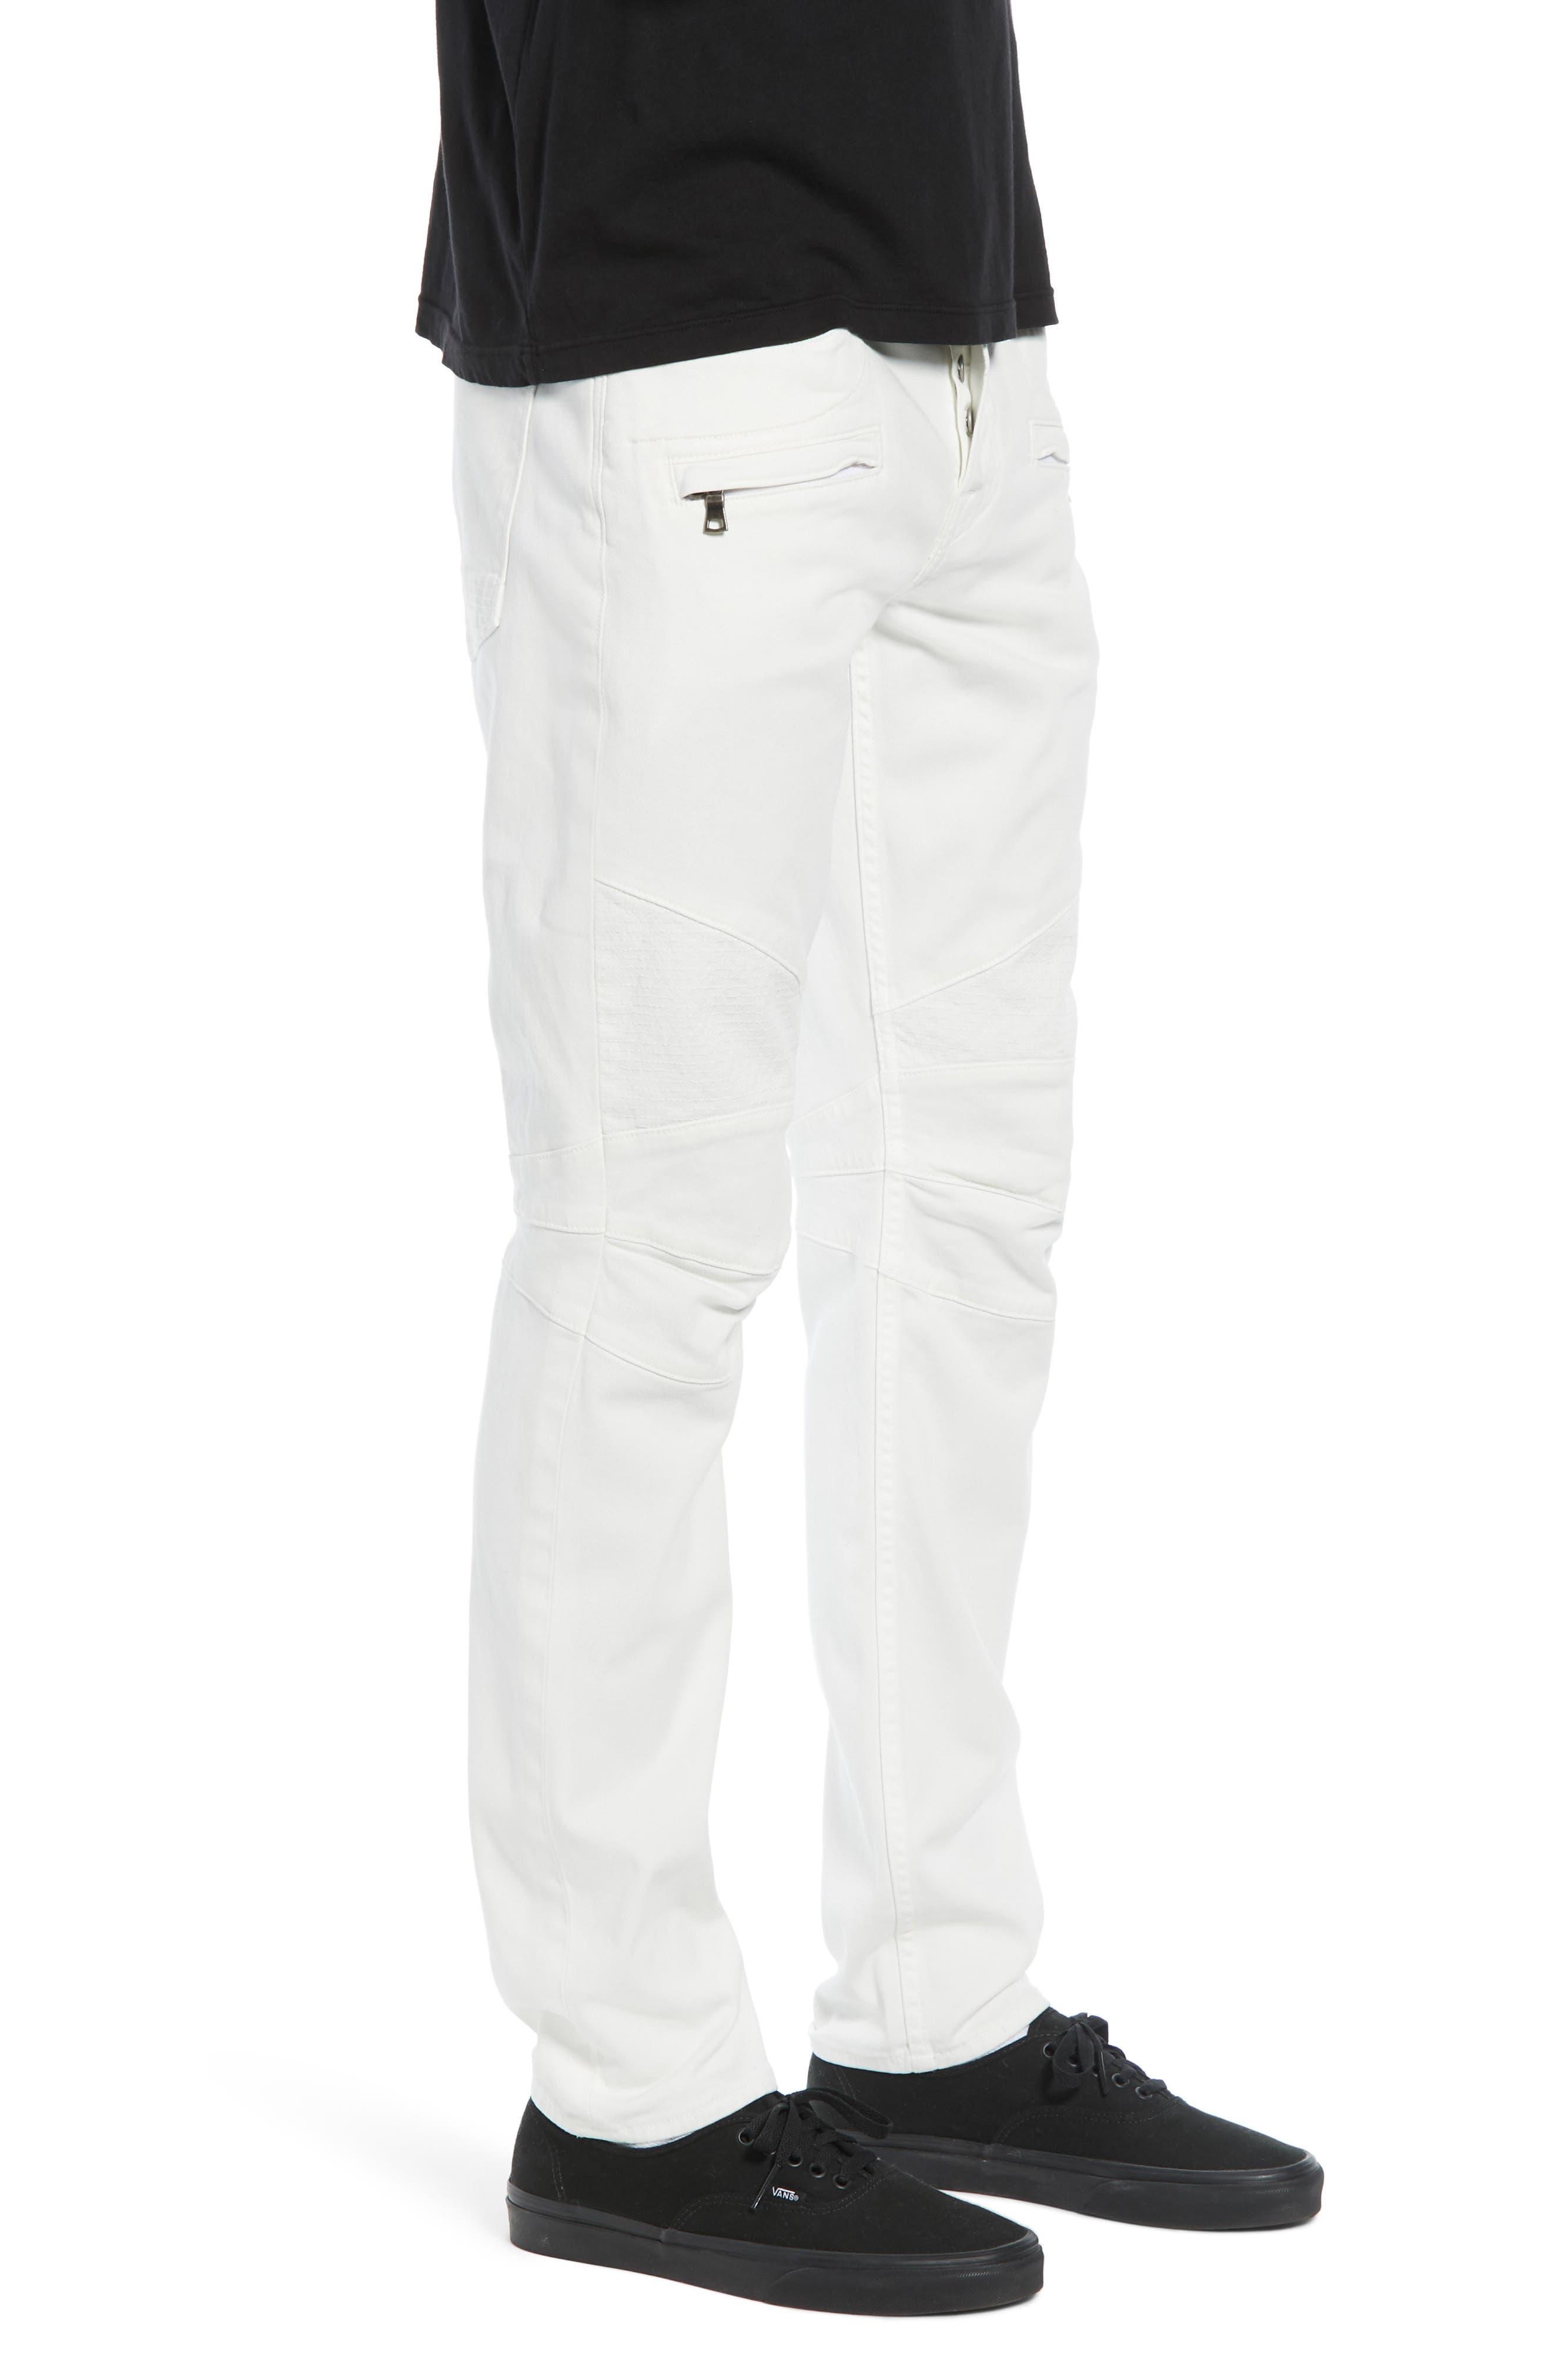 Blinder Biker Skinny Fit Jeans,                             Alternate thumbnail 3, color,                             DIRTY WHITE